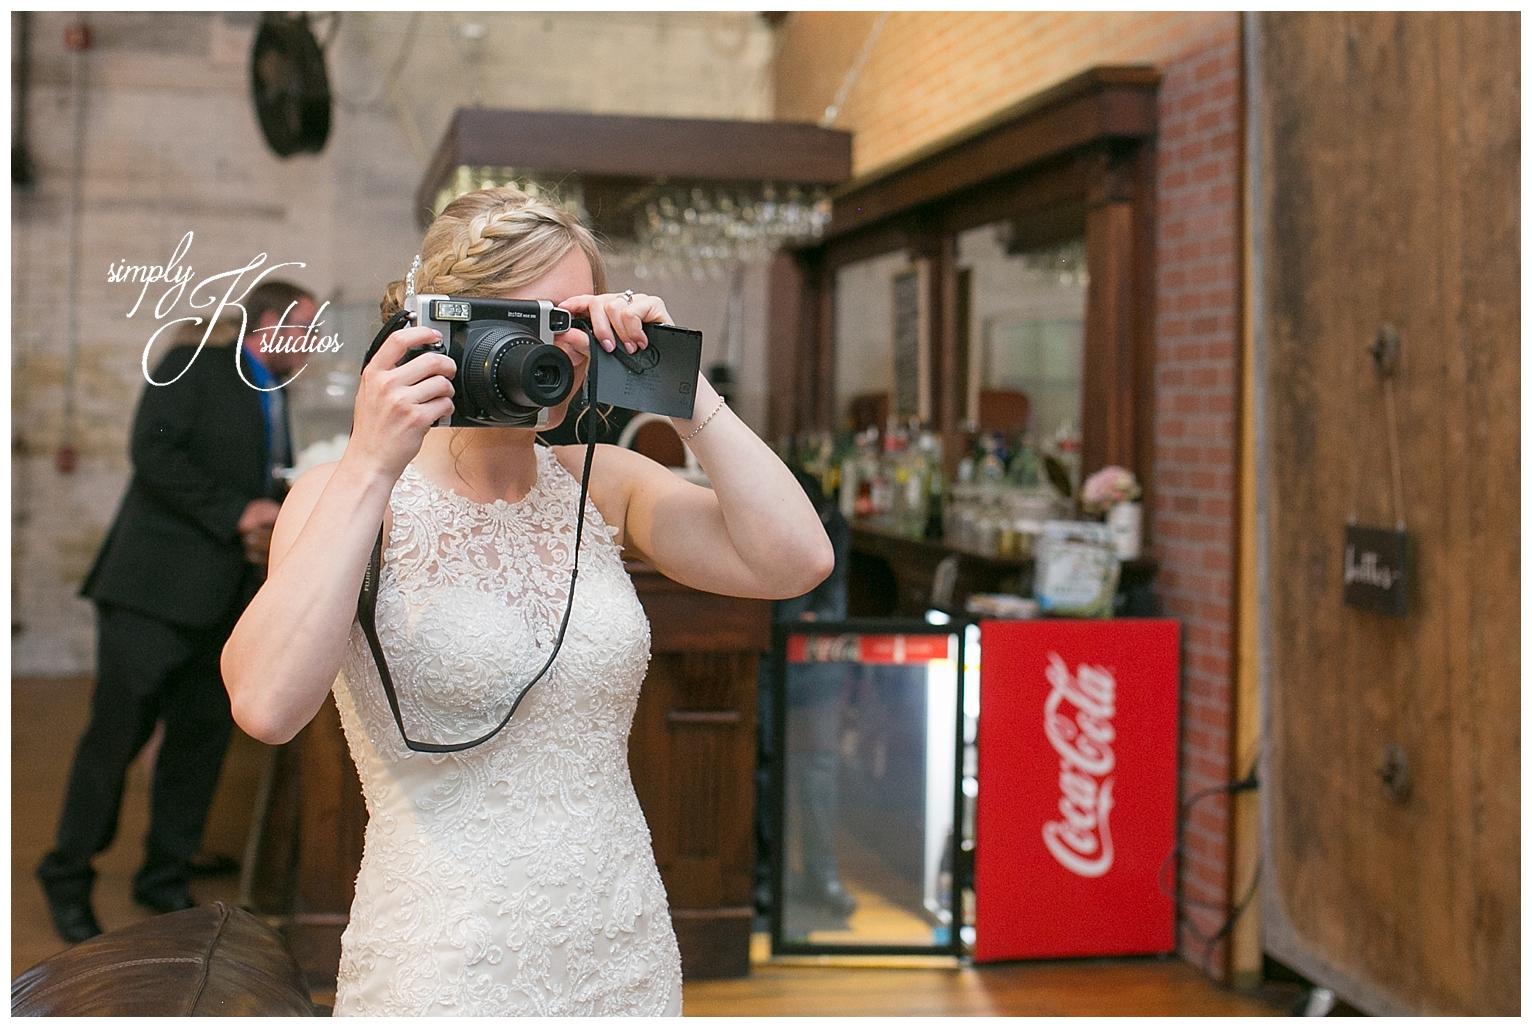 Fujifilm Photo Booth.jpg